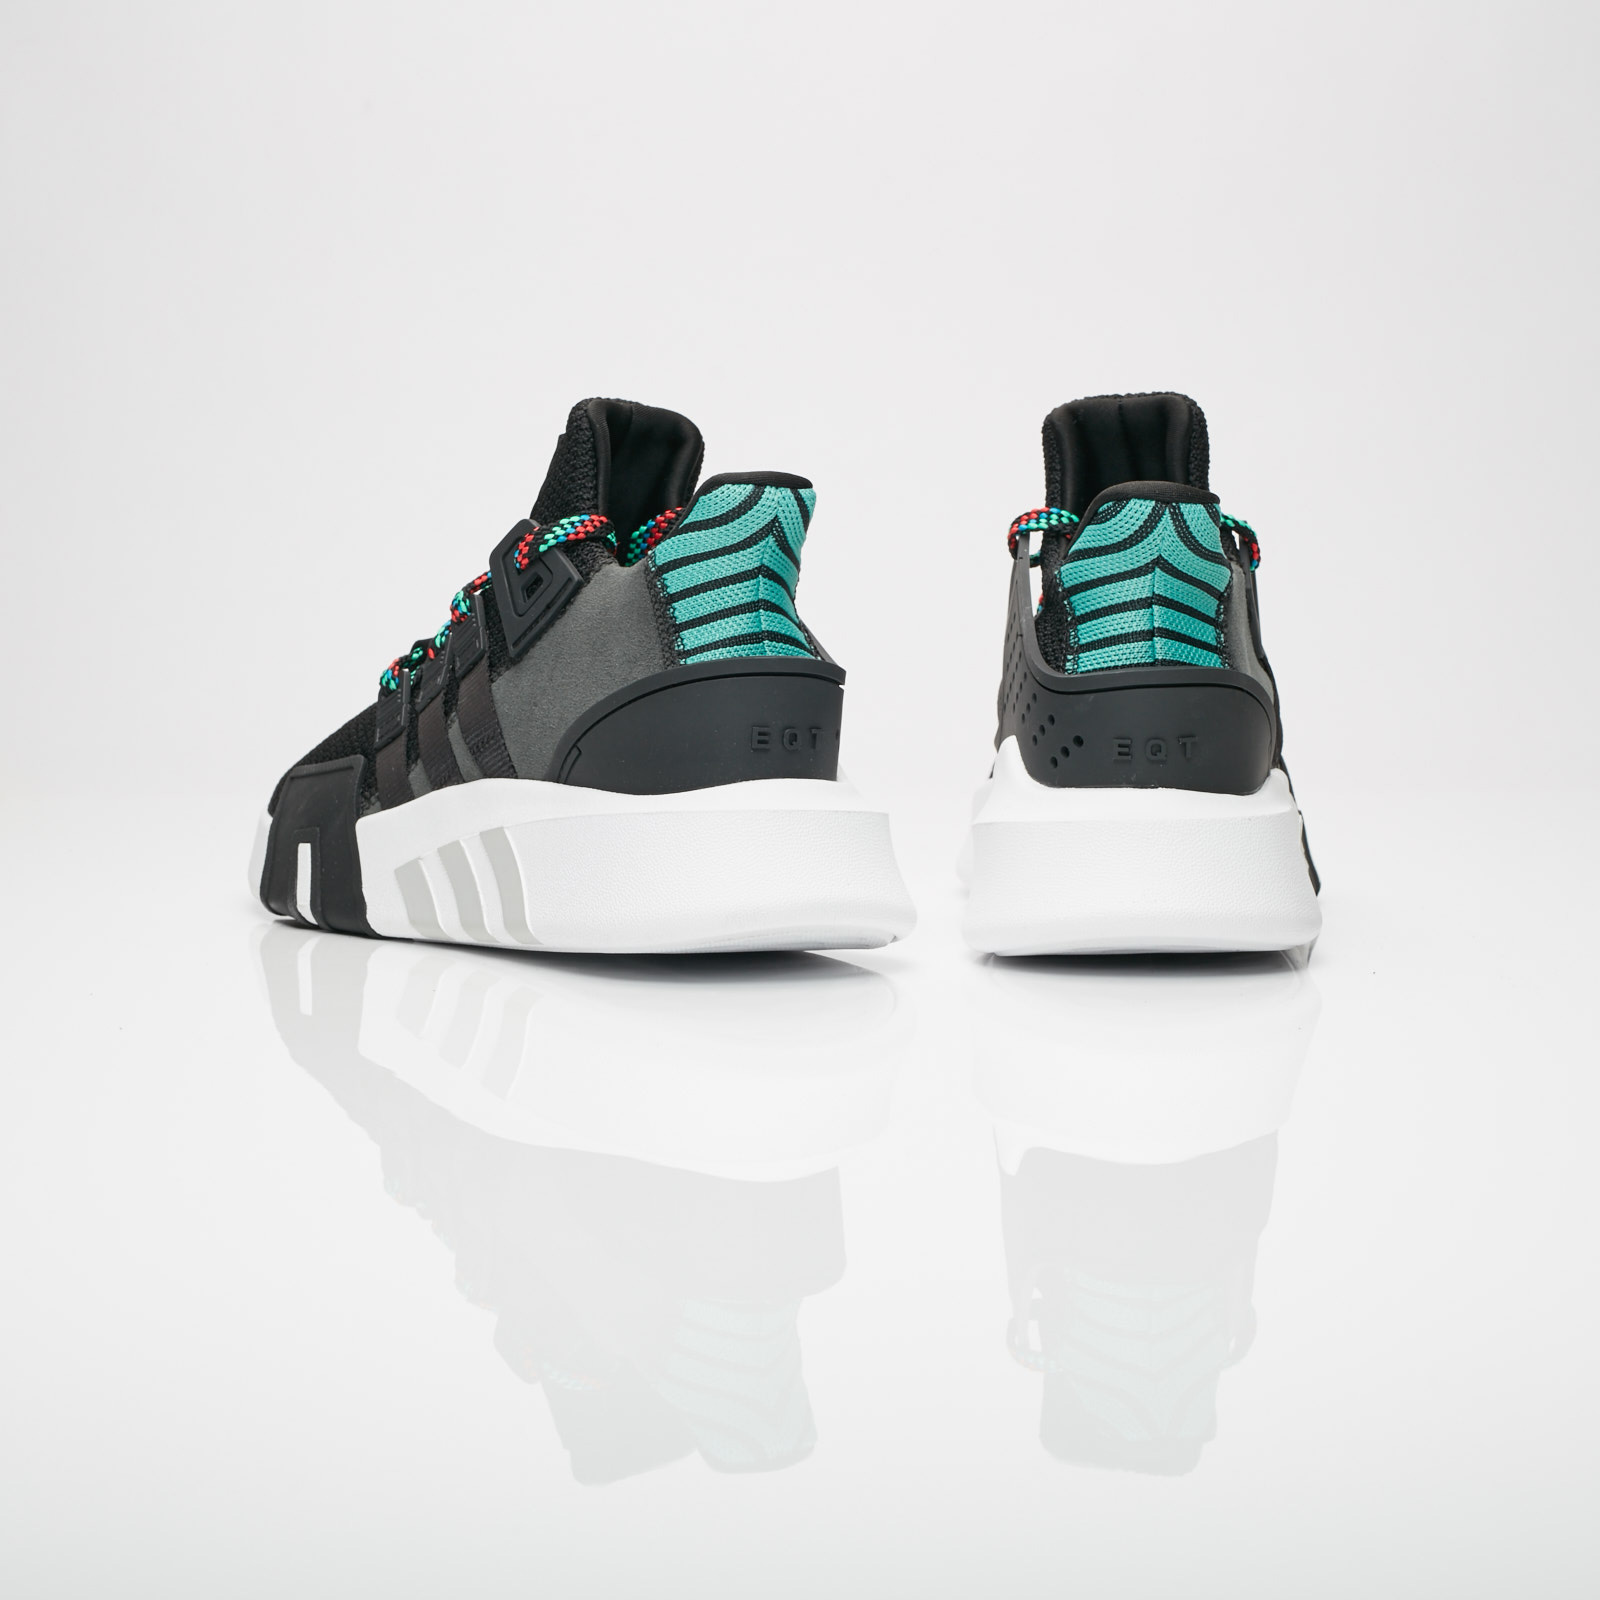 d2f83fa60648 adidas EQT Basketball ADV - Cq2993 - Sneakersnstuff